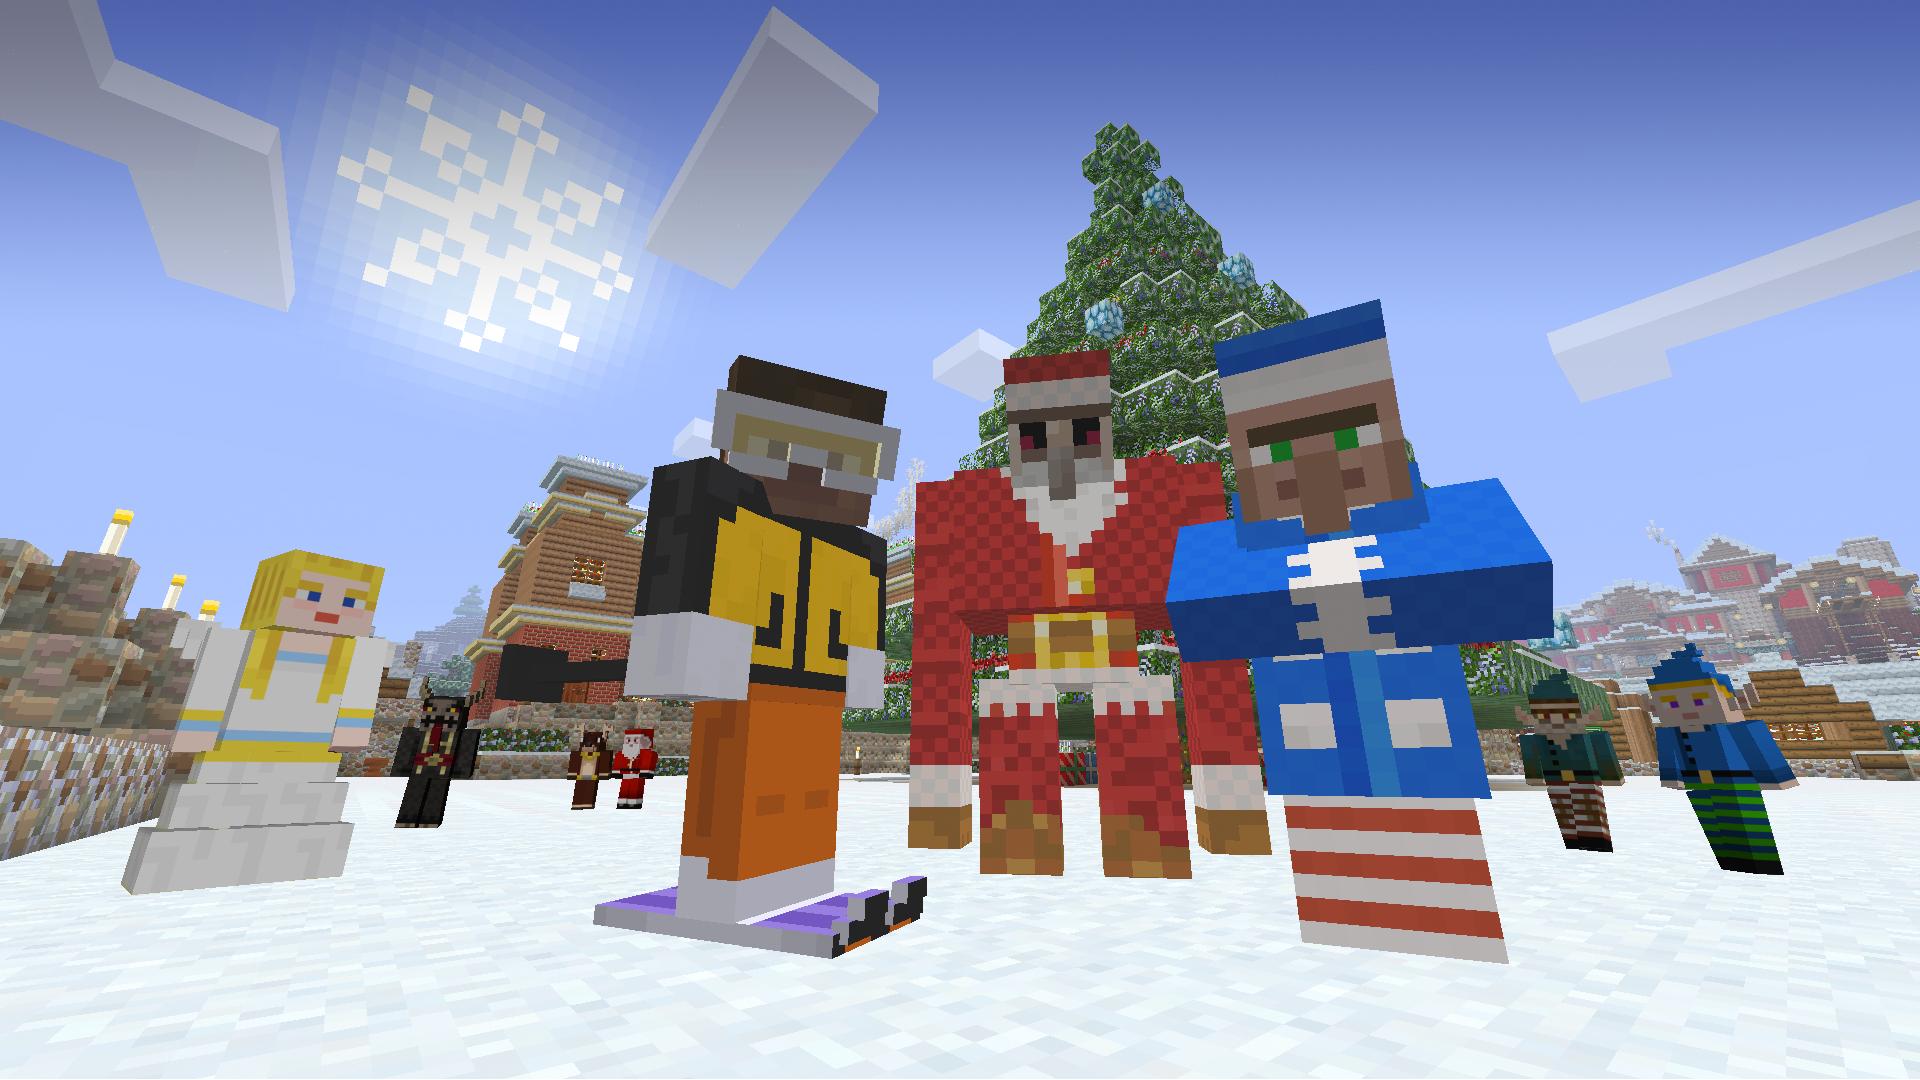 Most Inspiring Wallpaper Minecraft Winter - festivemashuppack_xboxone_1920x1080  HD_87224.png